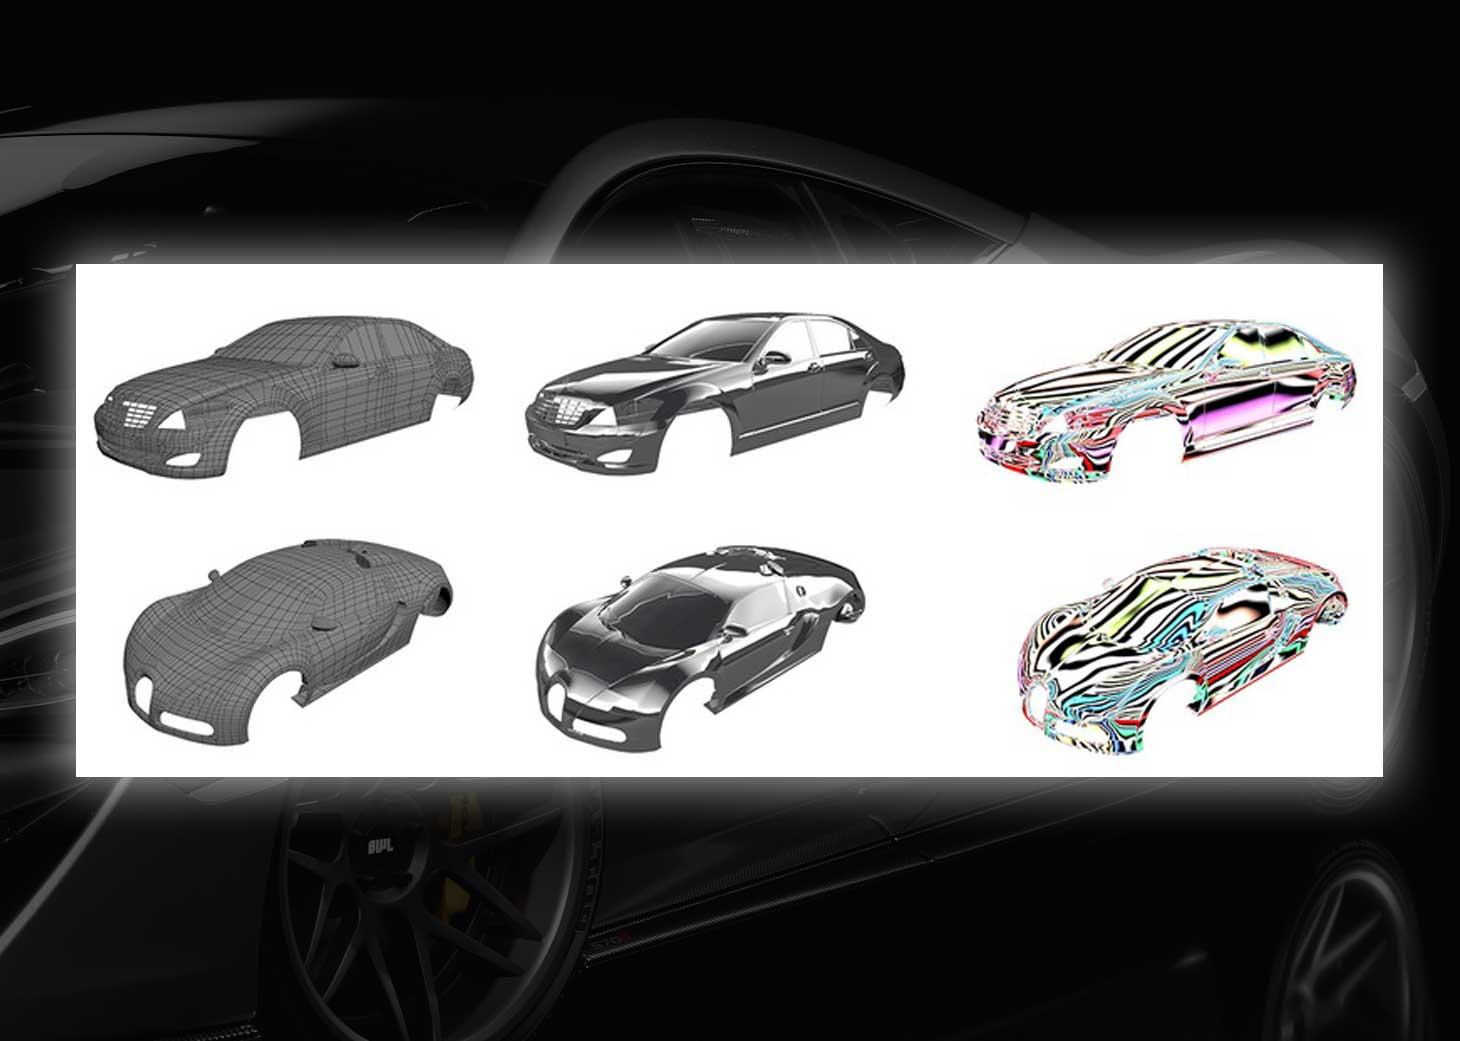 modeling using polygons car 3ds max maya13pg - مدلسازی خودرو در تری دی مکس